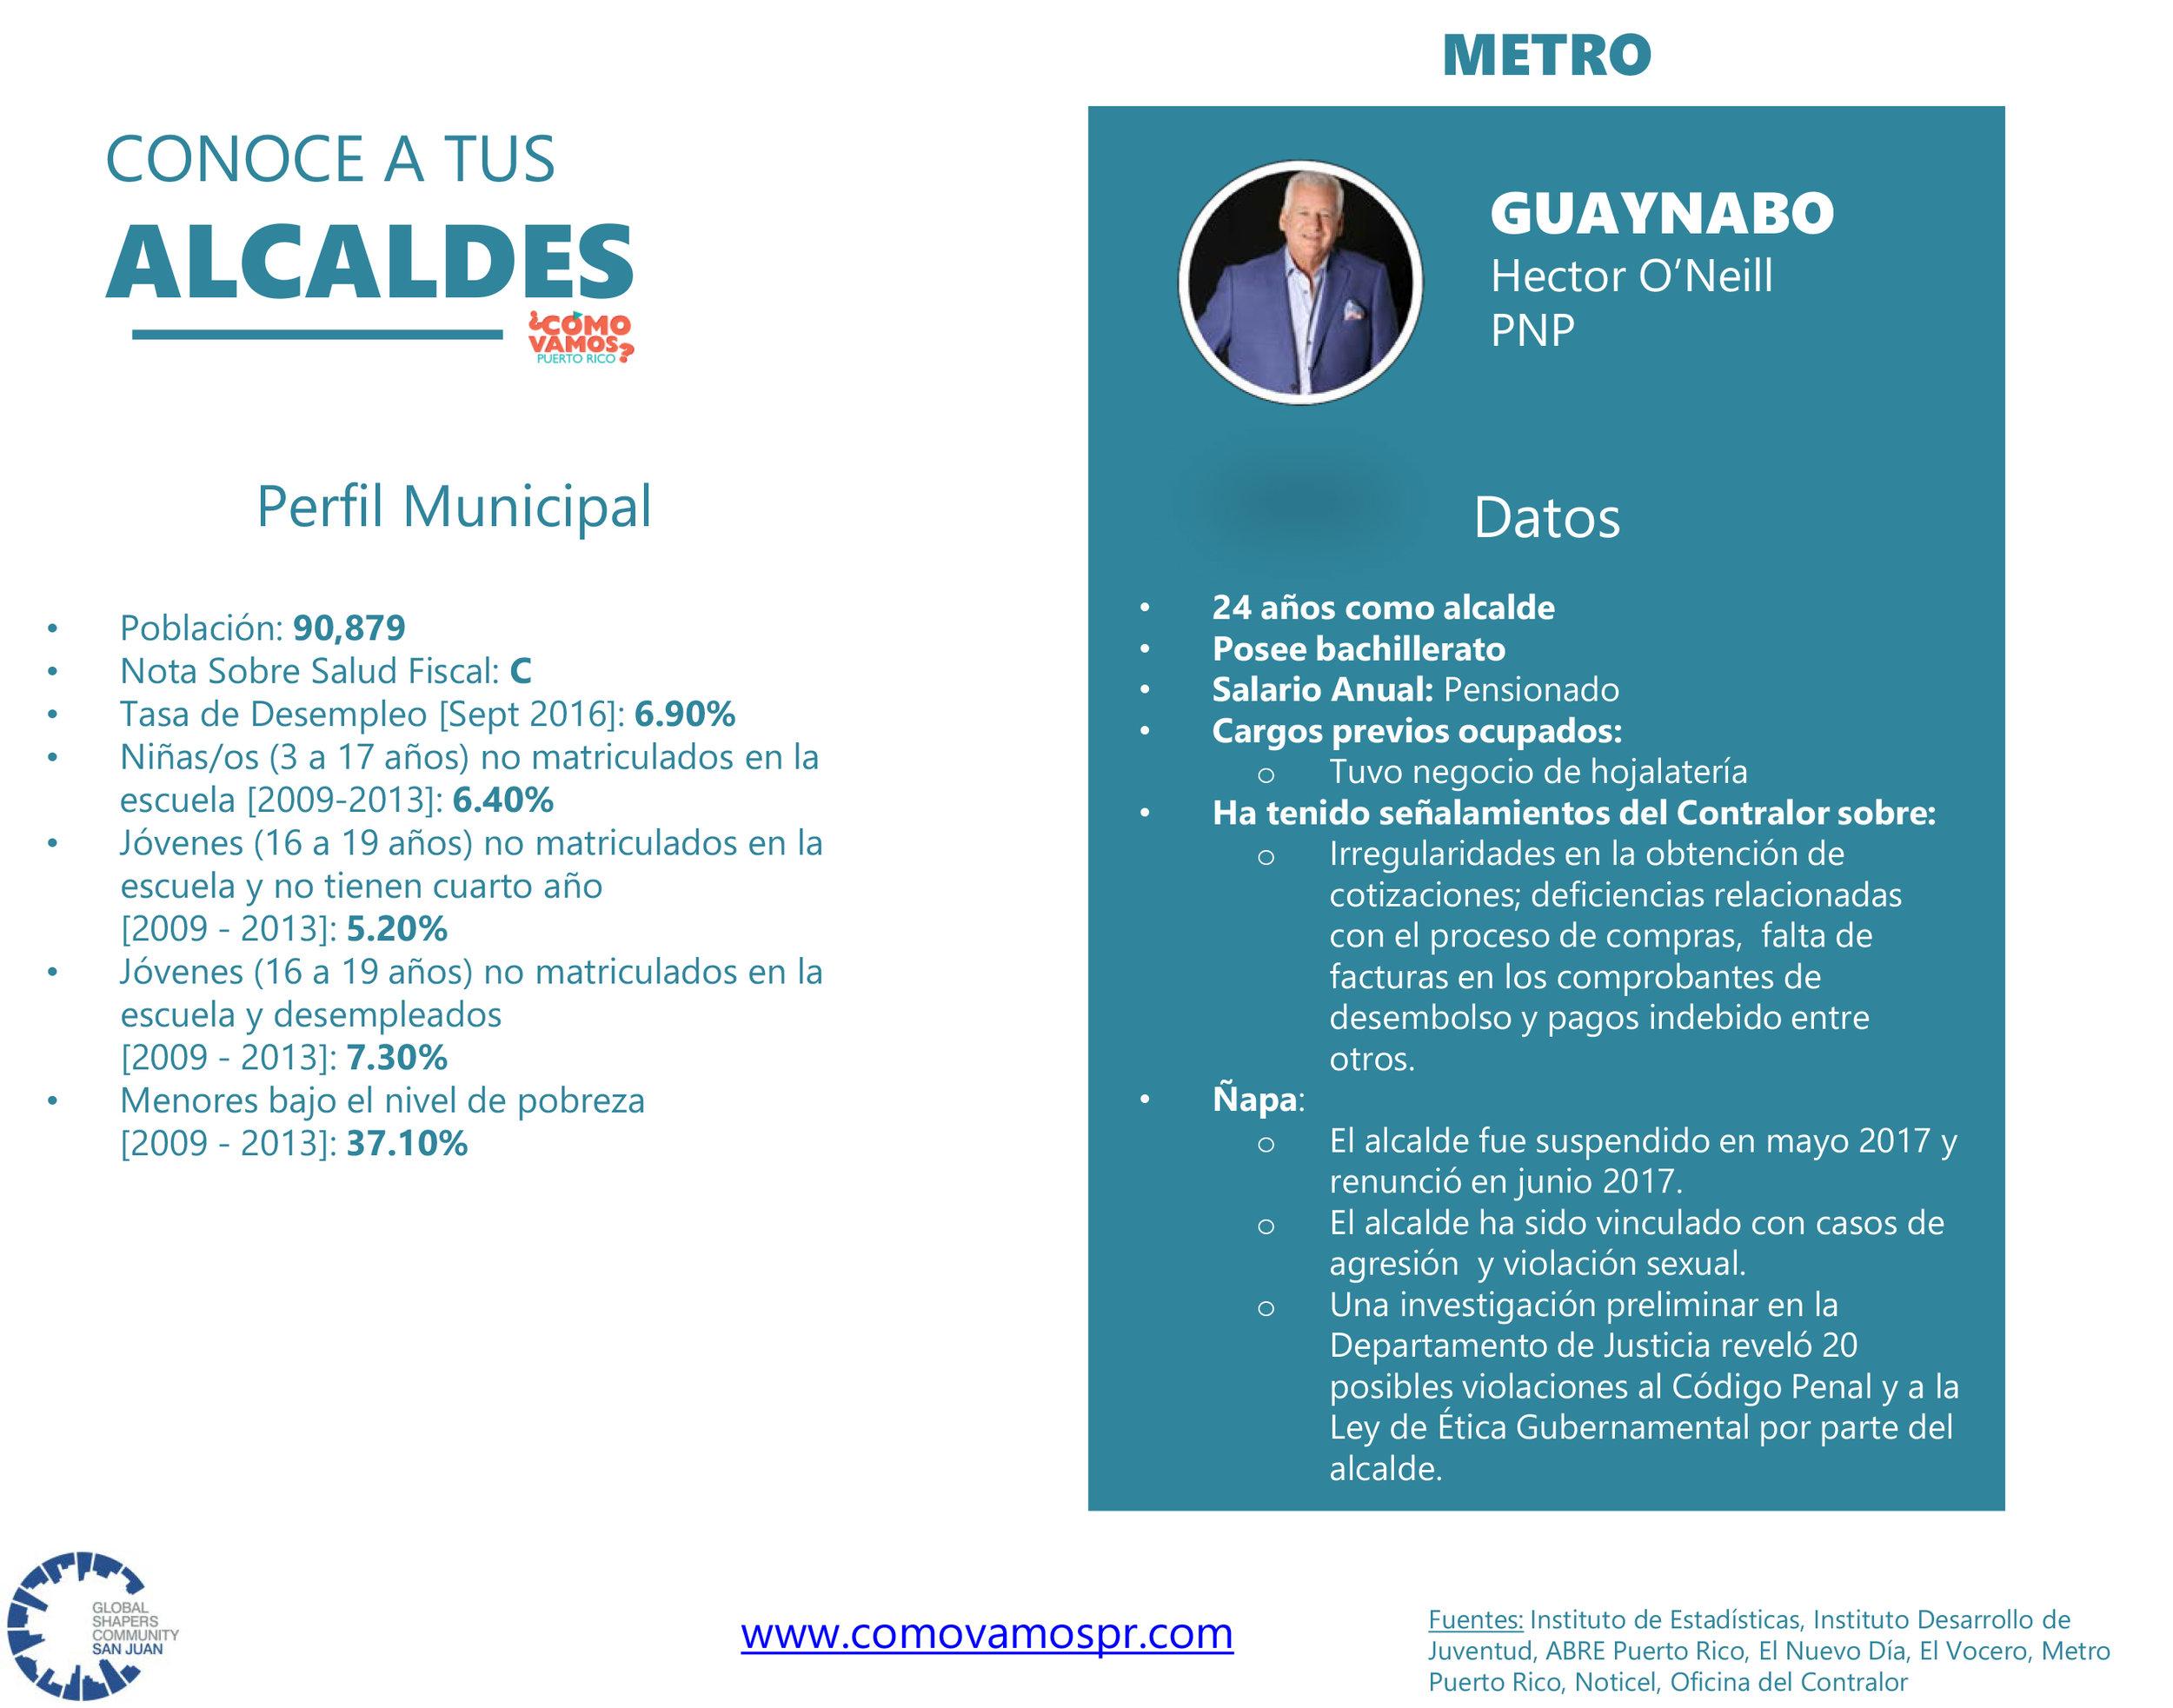 Alcaldes_Metro_Guaynabo.jpg